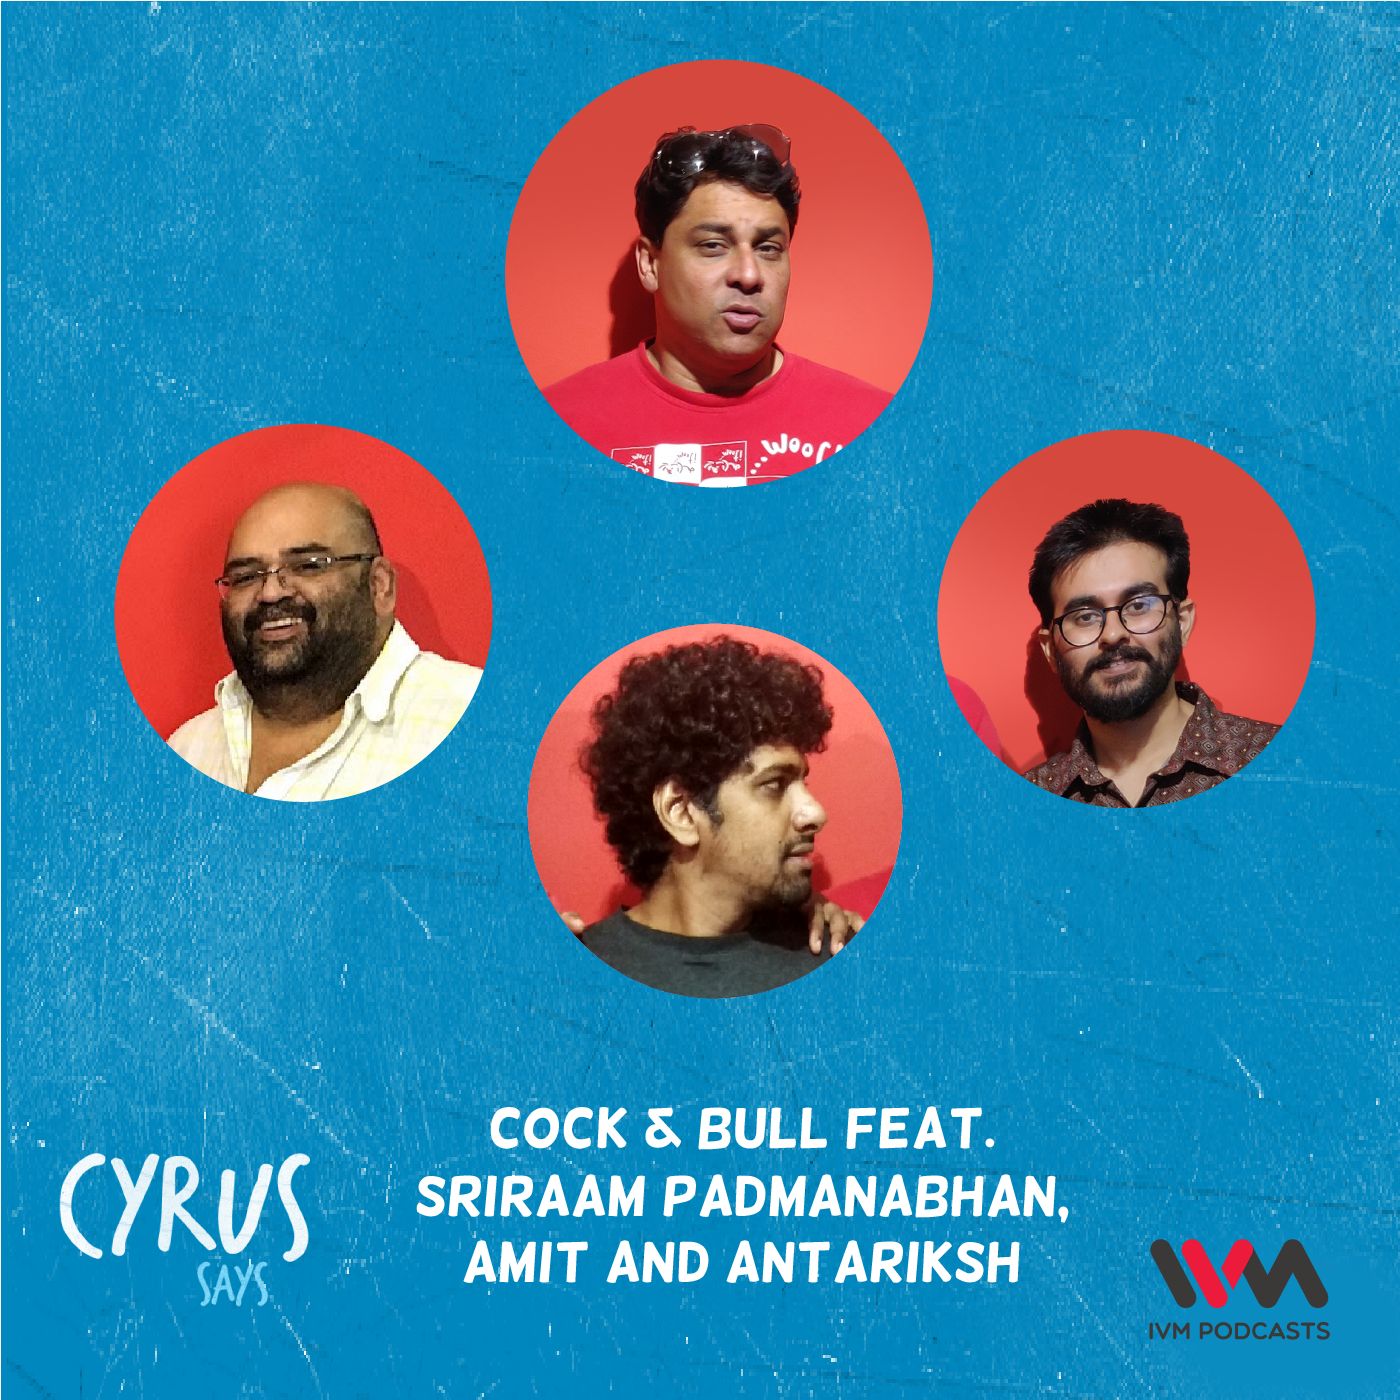 Ep. 631: Cock & Bull feat. Sriraam Padmanabhan, Amit and Antariksh